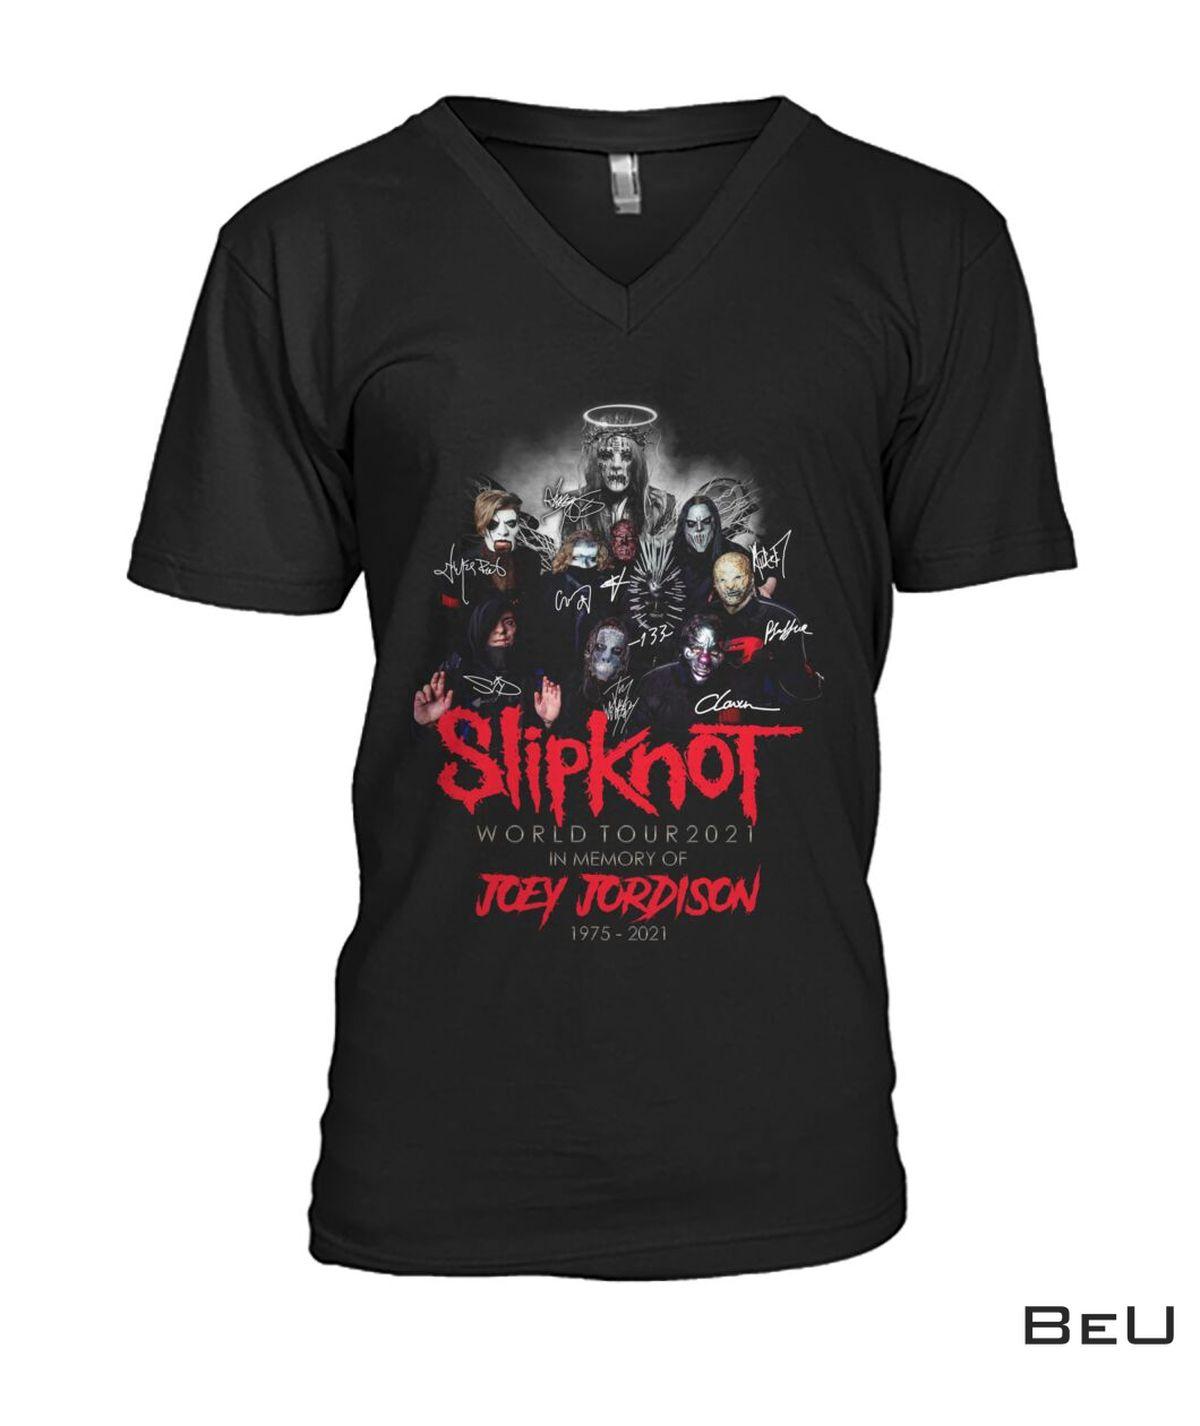 Great Quality Slipknot Joey Jordison World Tour 2021 Shirt, hoodie, tank top